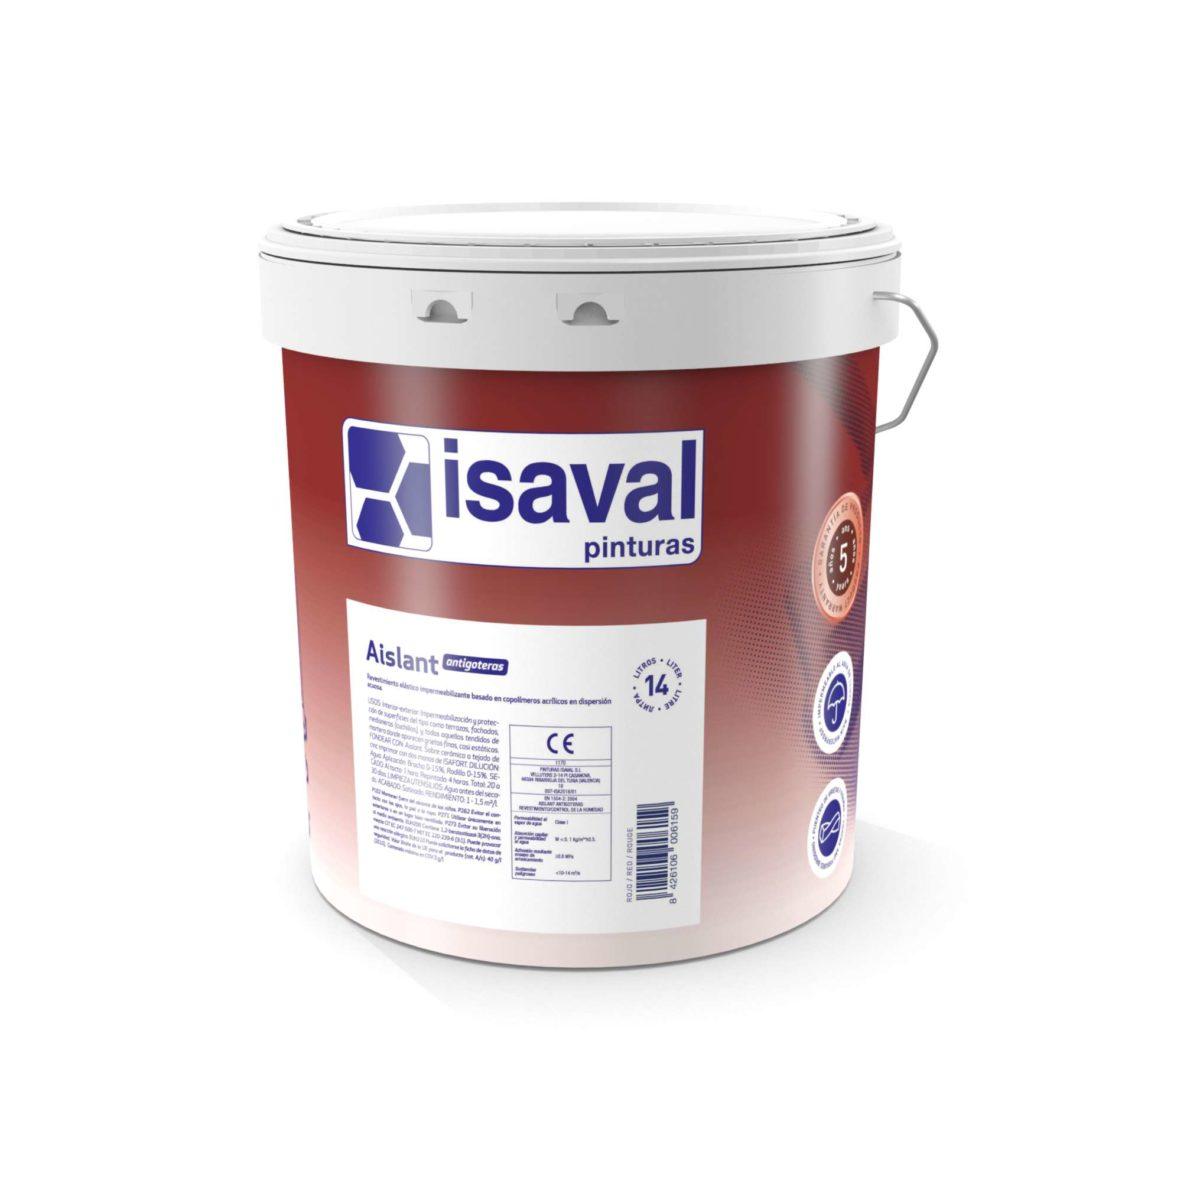 aislant Antigoteras. Rev elástico impermeabilizante de Pinturas Isaval